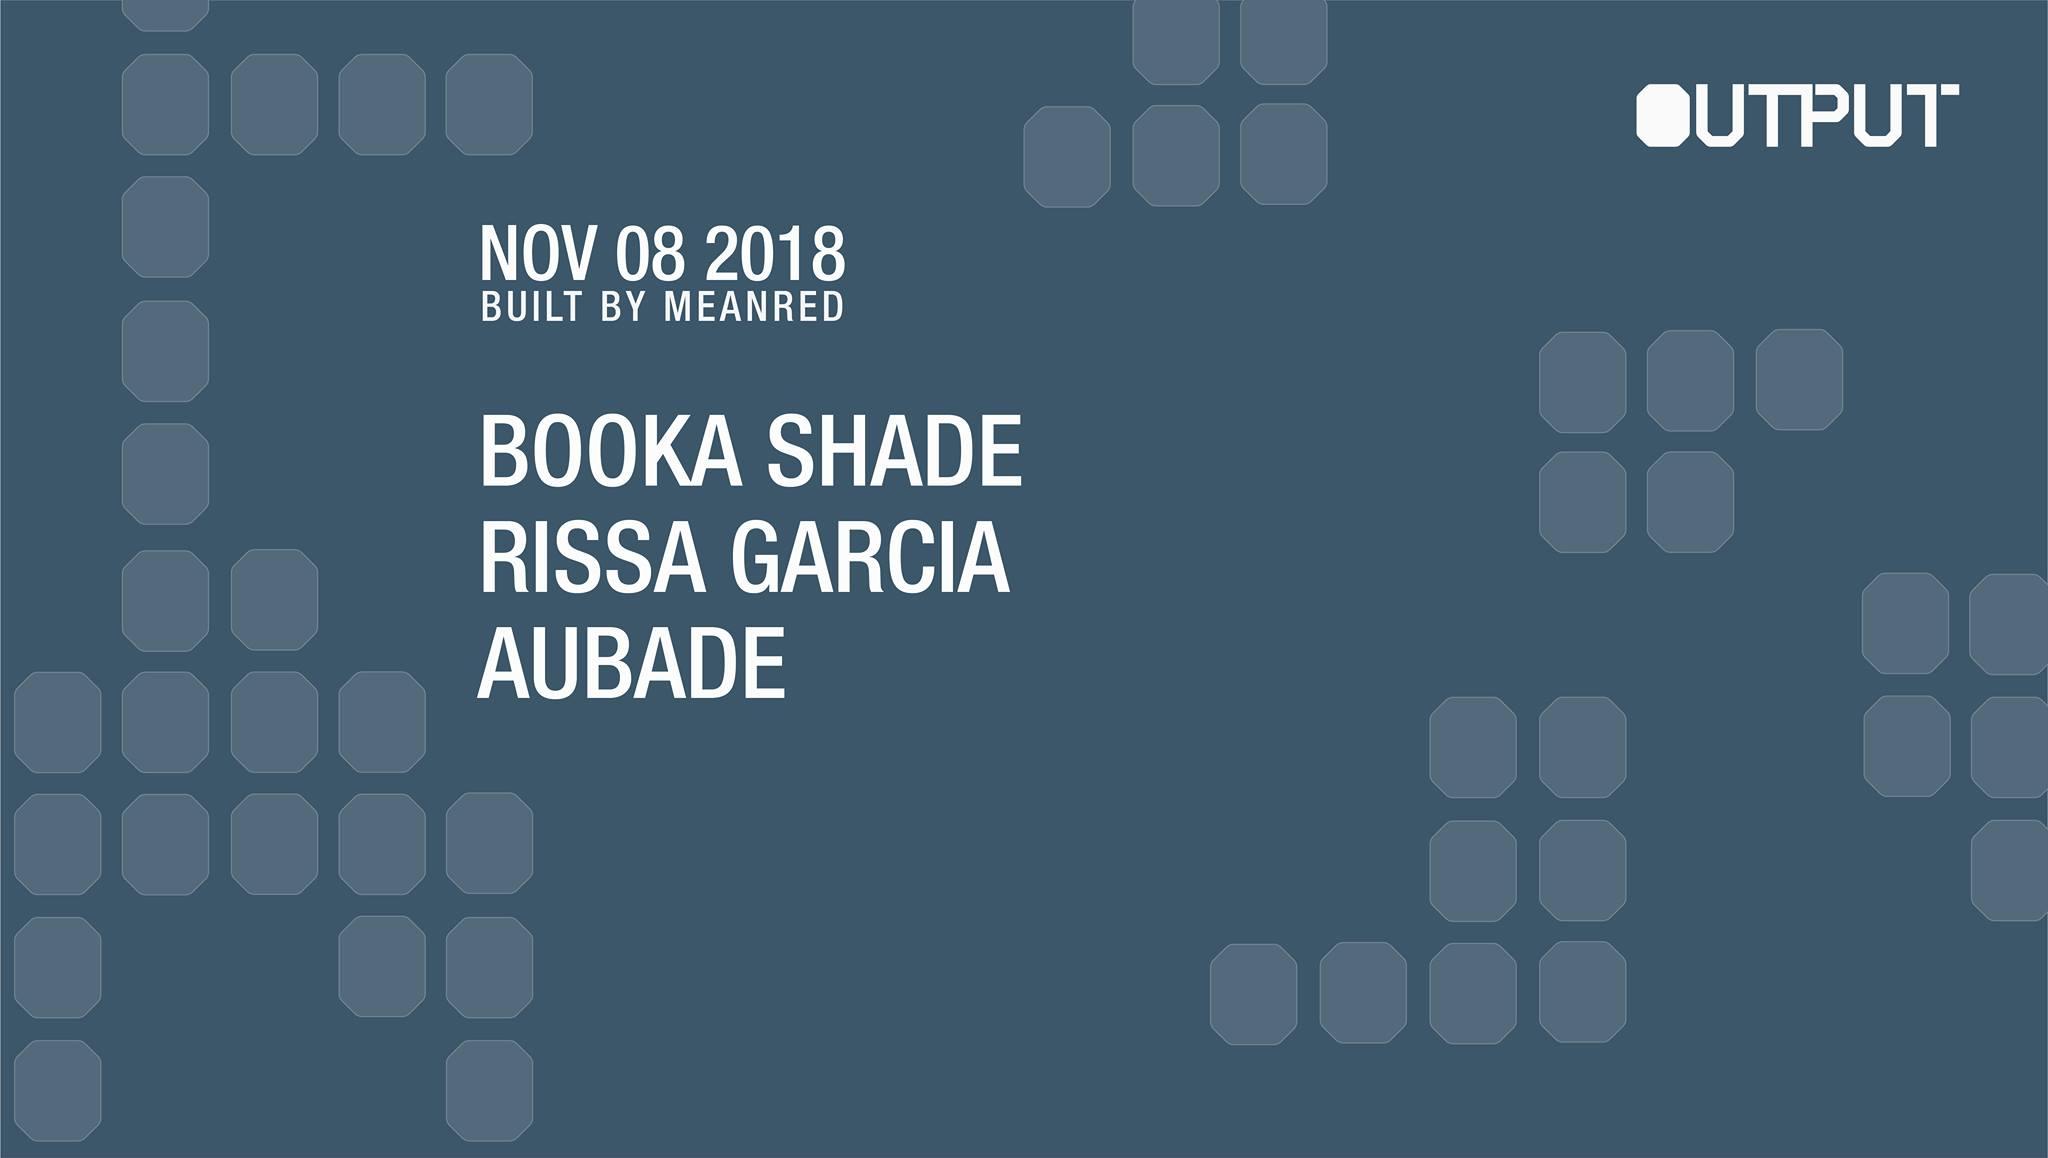 booka shade Output Club BK Robbie Lumpkin Promotions